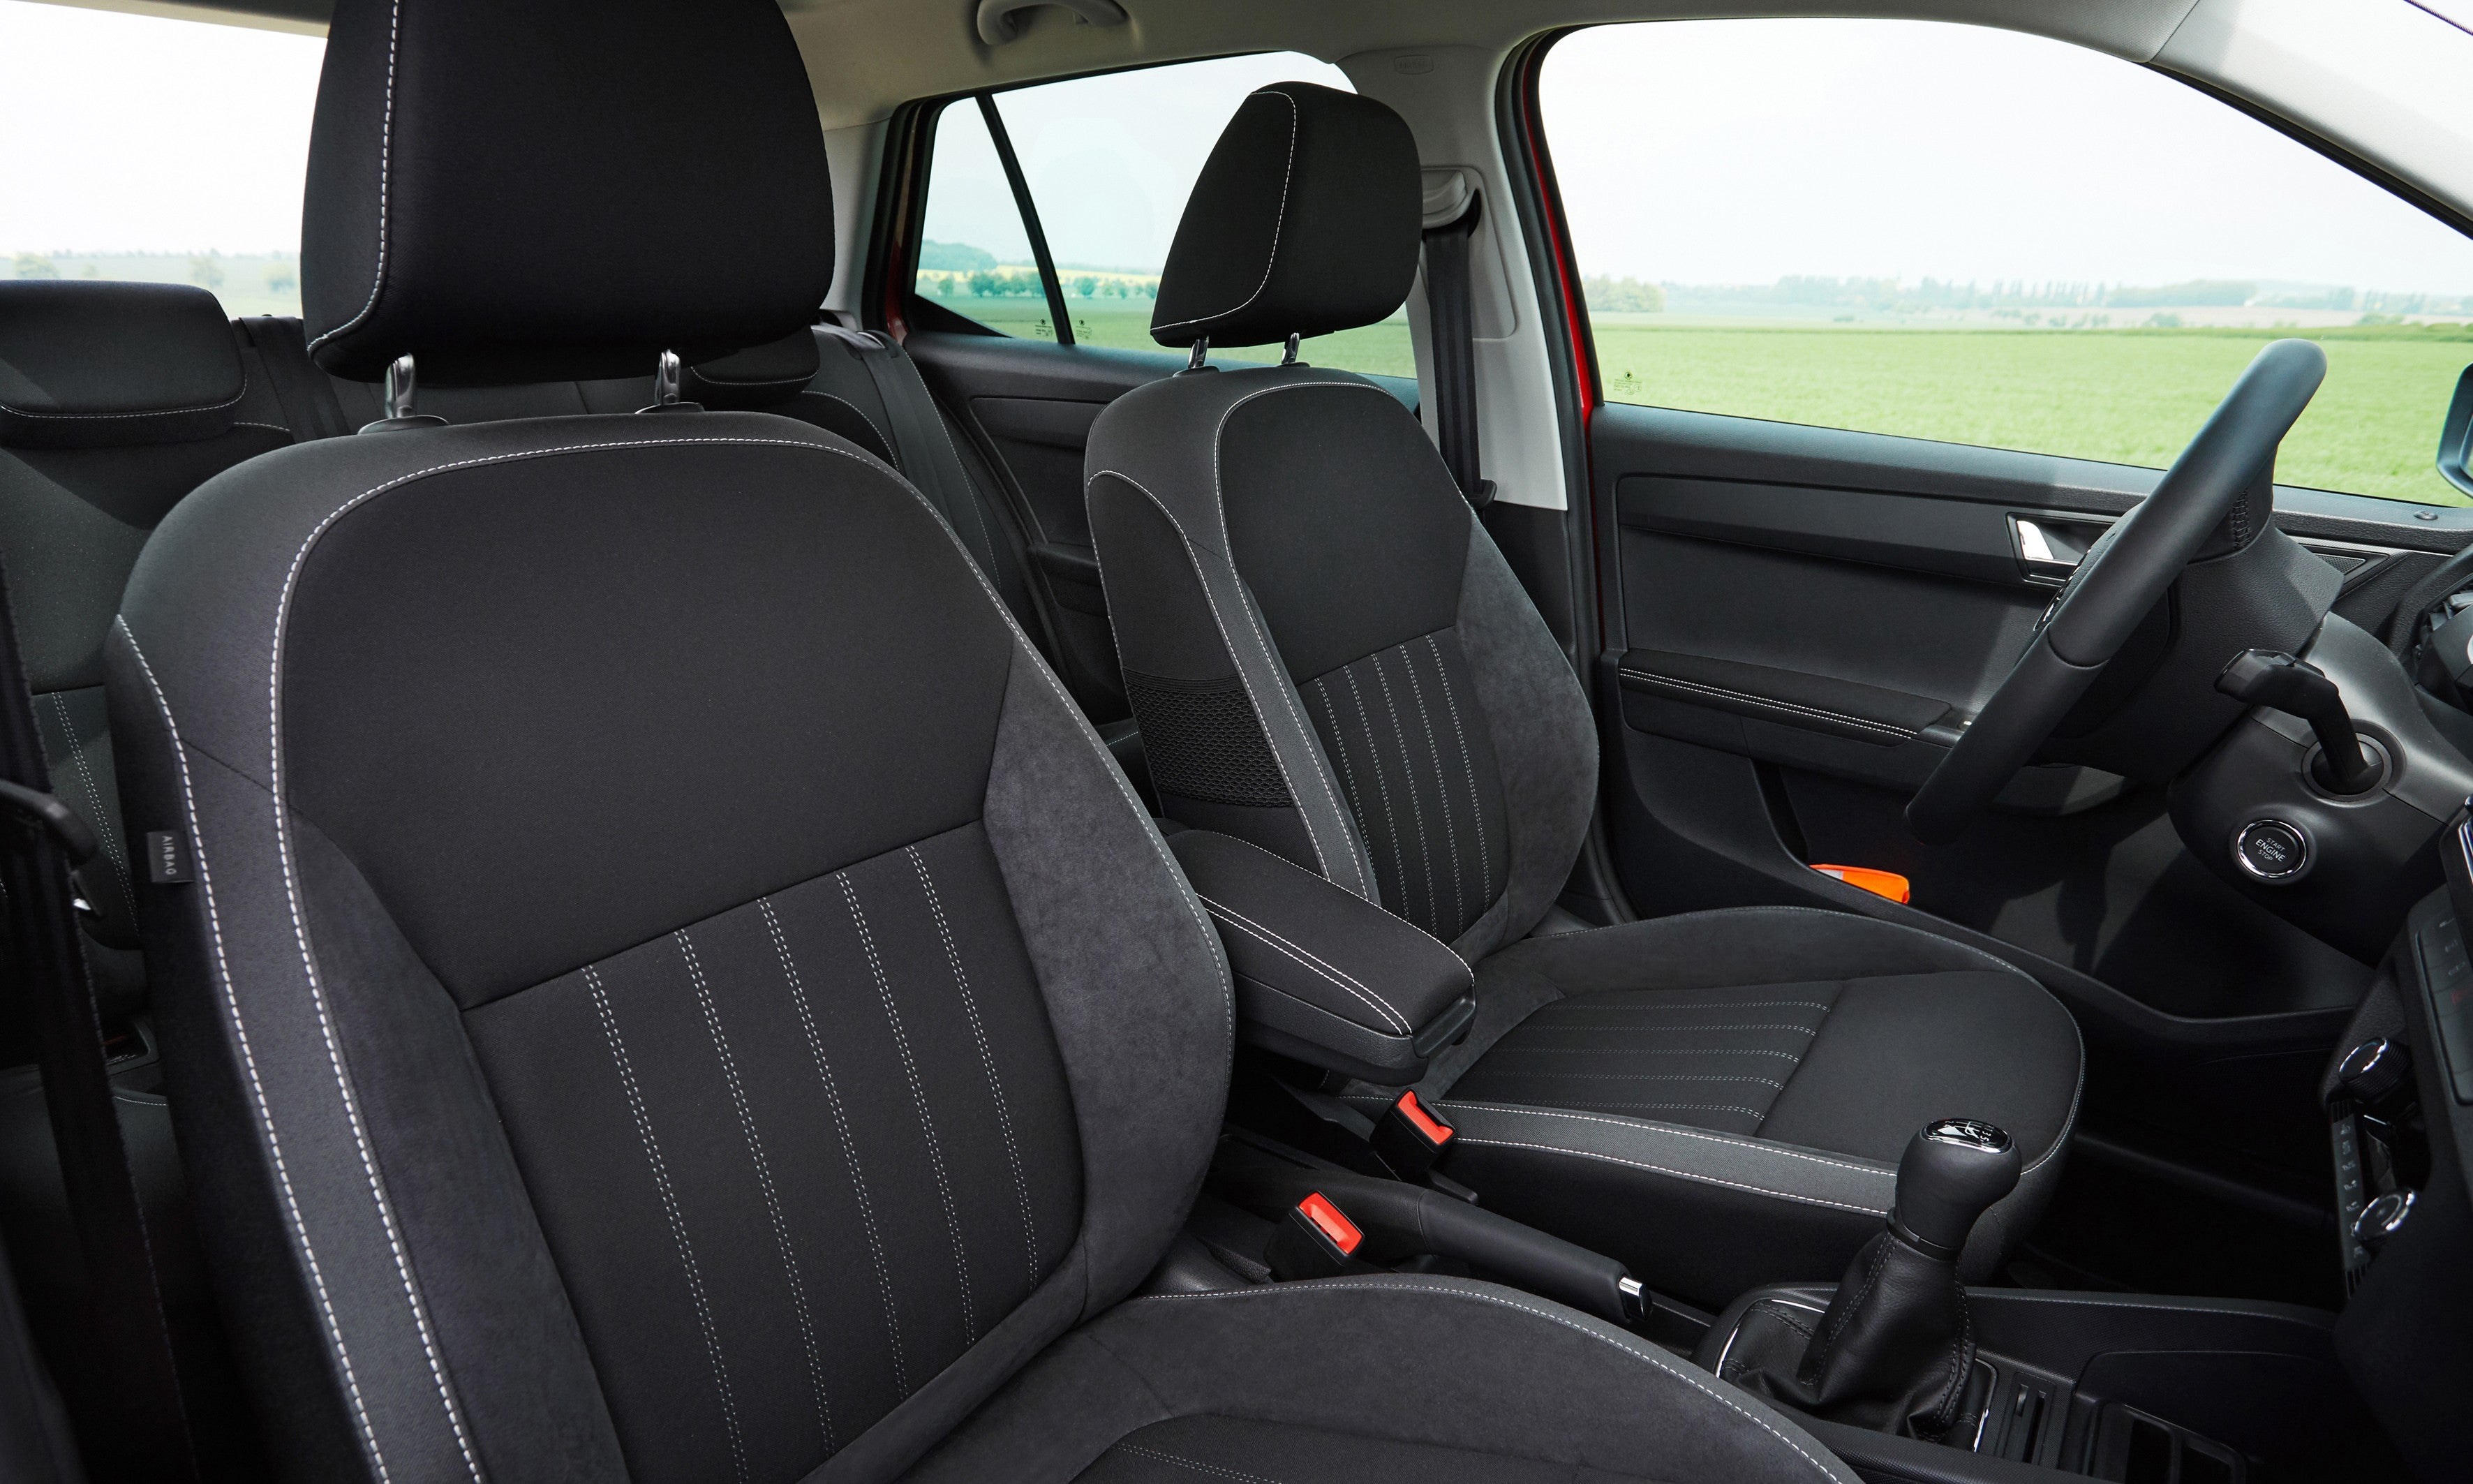 Skoda Fabia Front Car Seats